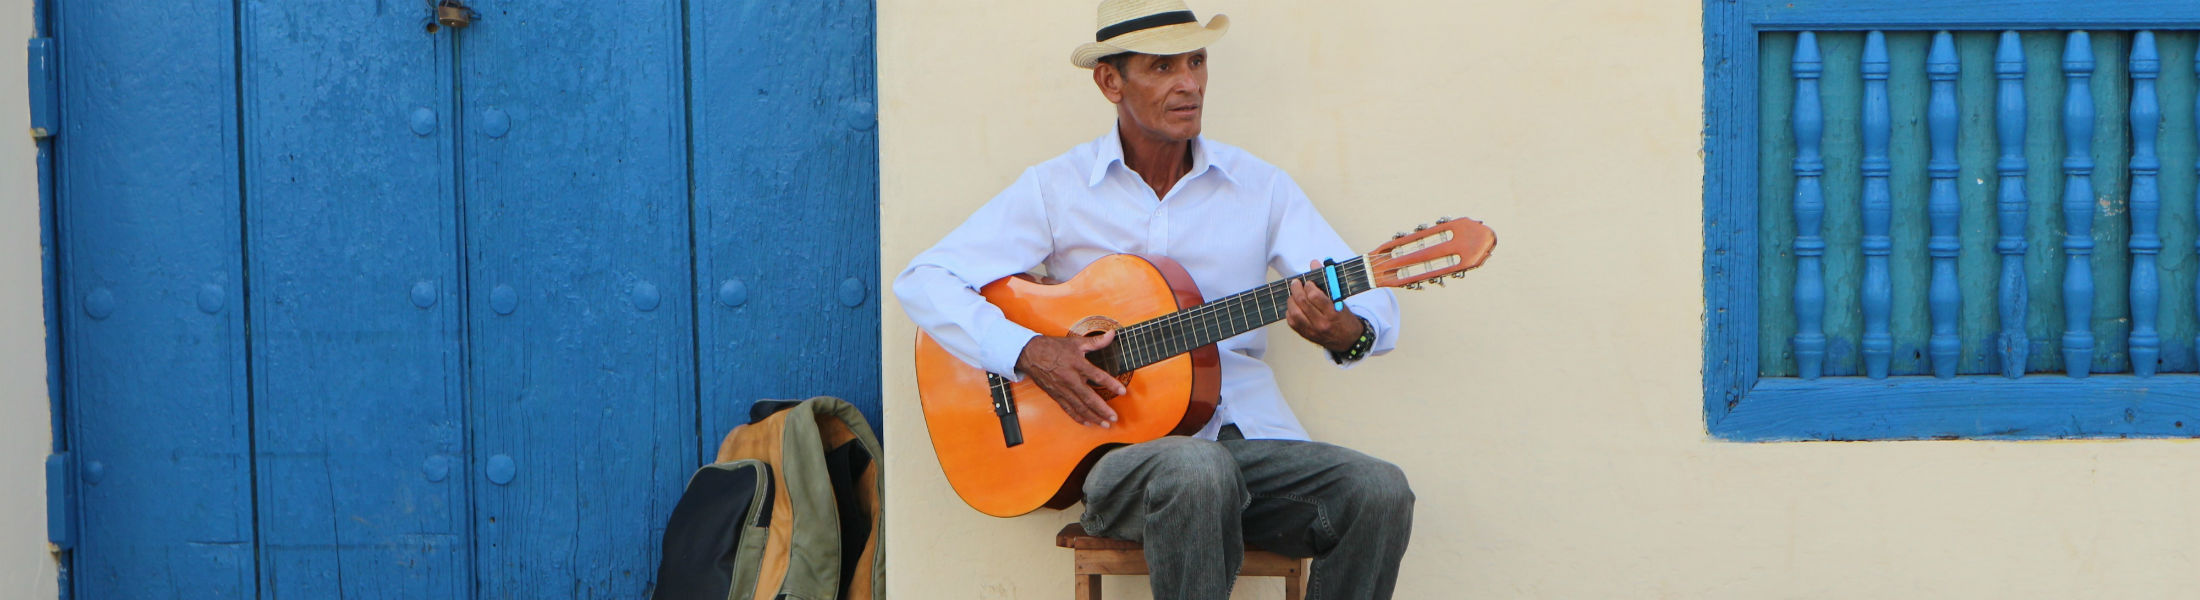 Cuban man wearing traditional panama straw hat playing an acoustic guitar_